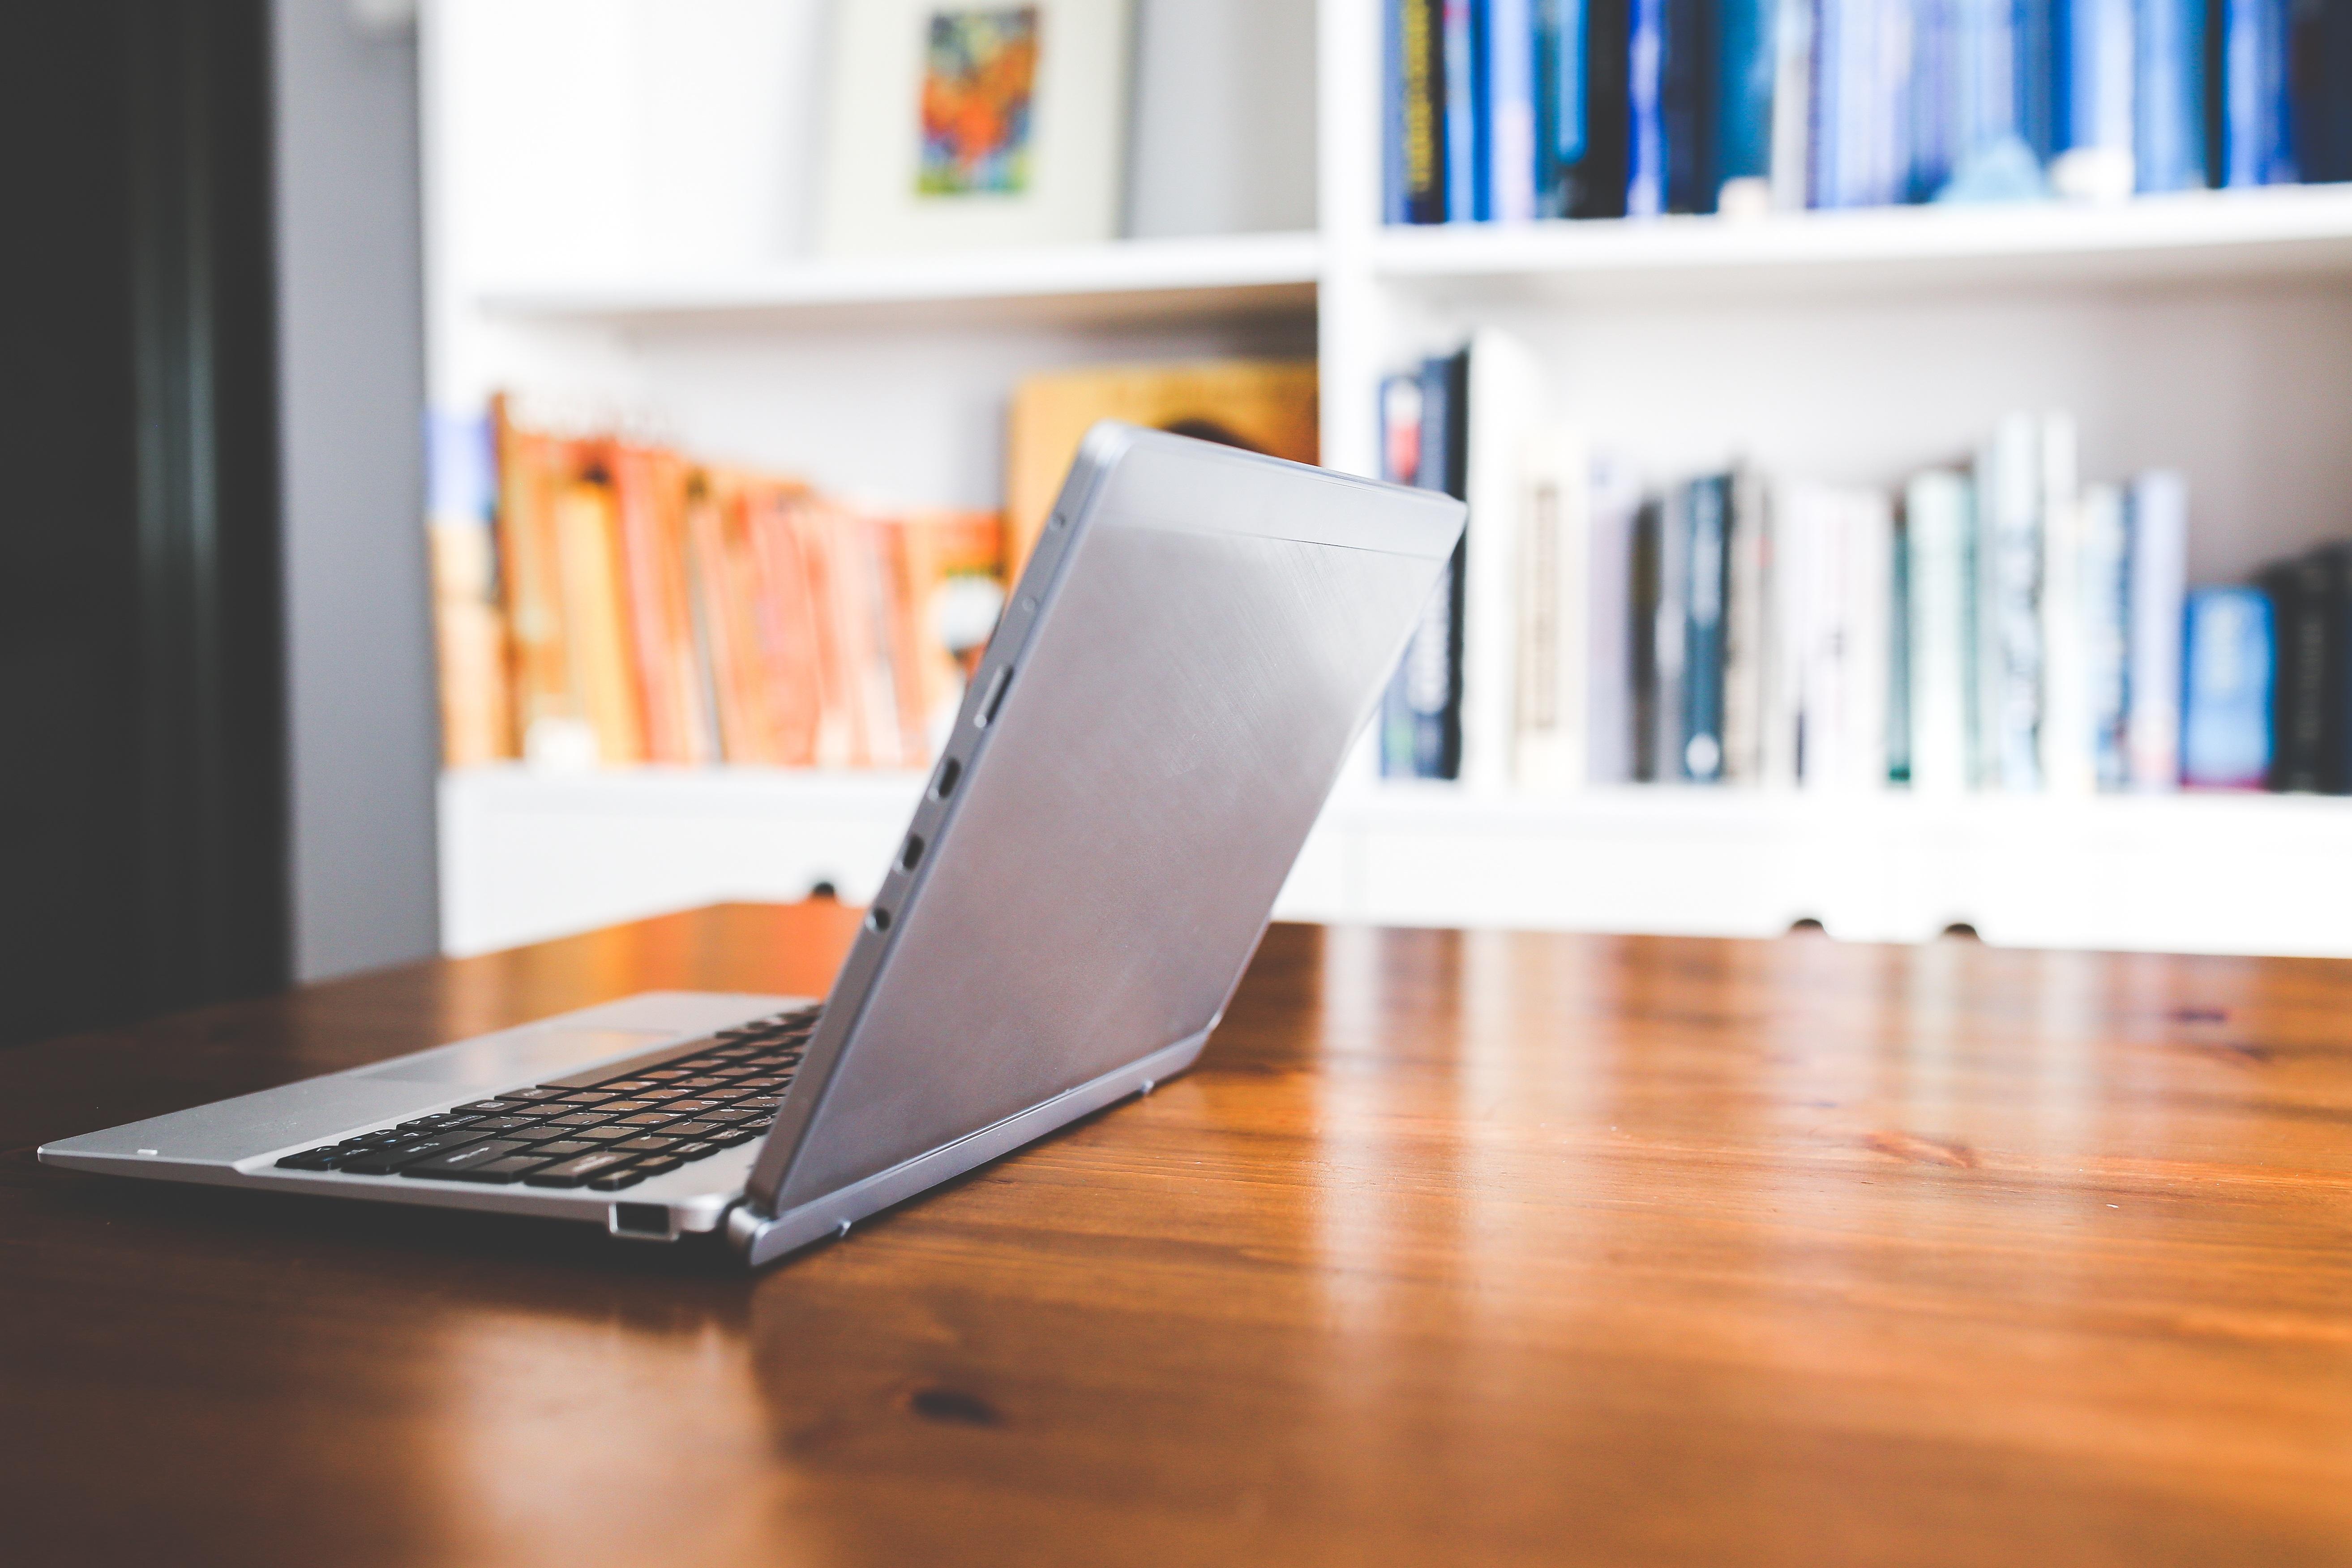 Free Images Laptop Desk Work Table Technology Floor Home